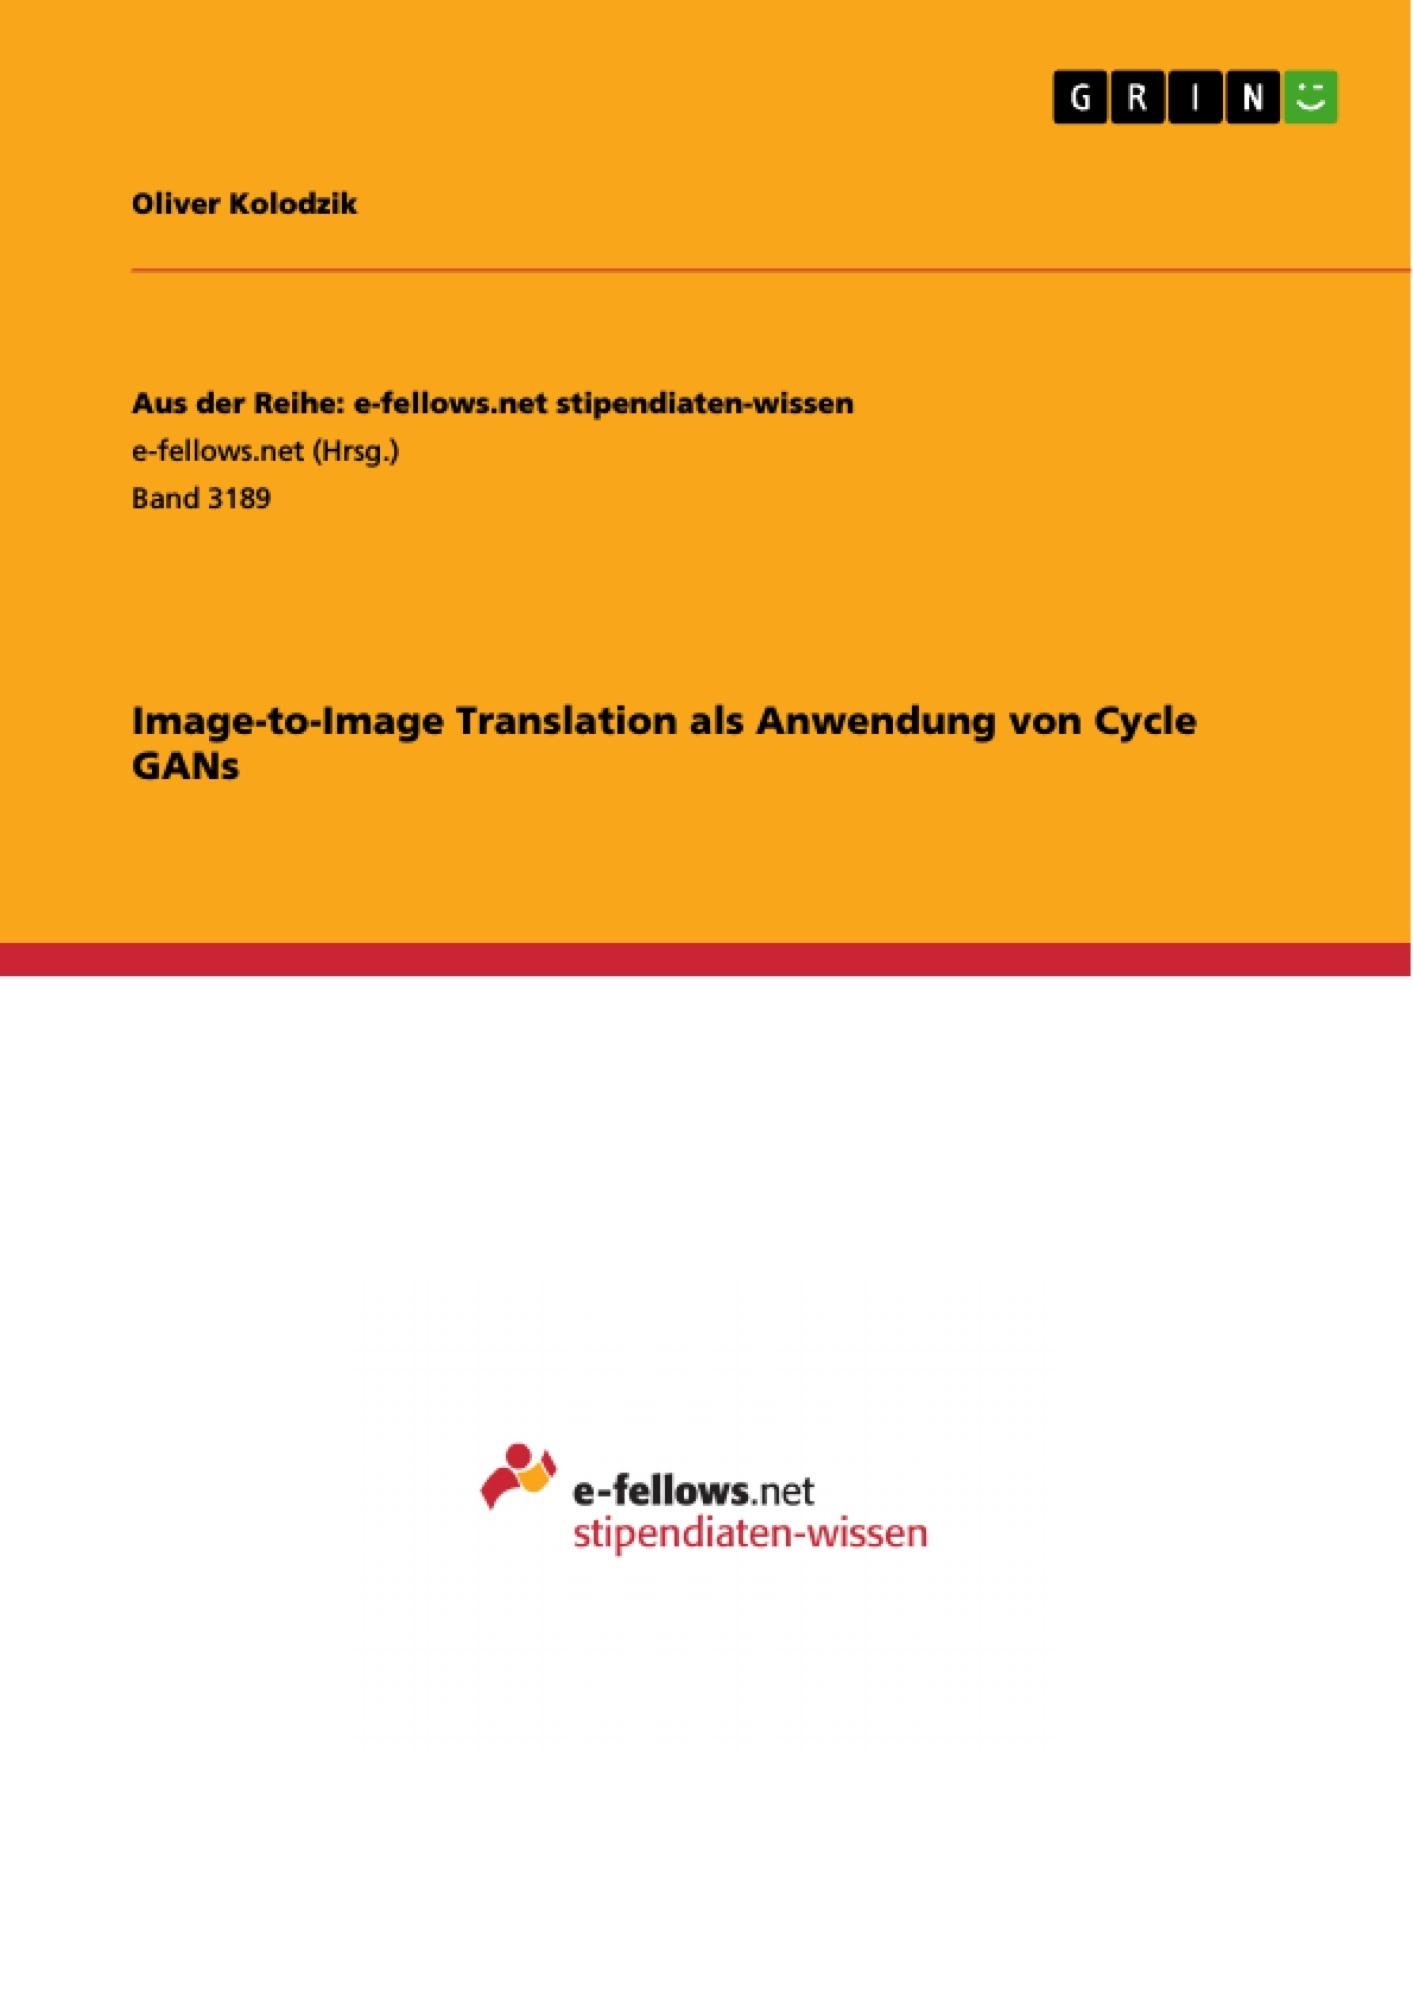 Titel: Image-to-Image Translation als Anwendung von Cycle GANs